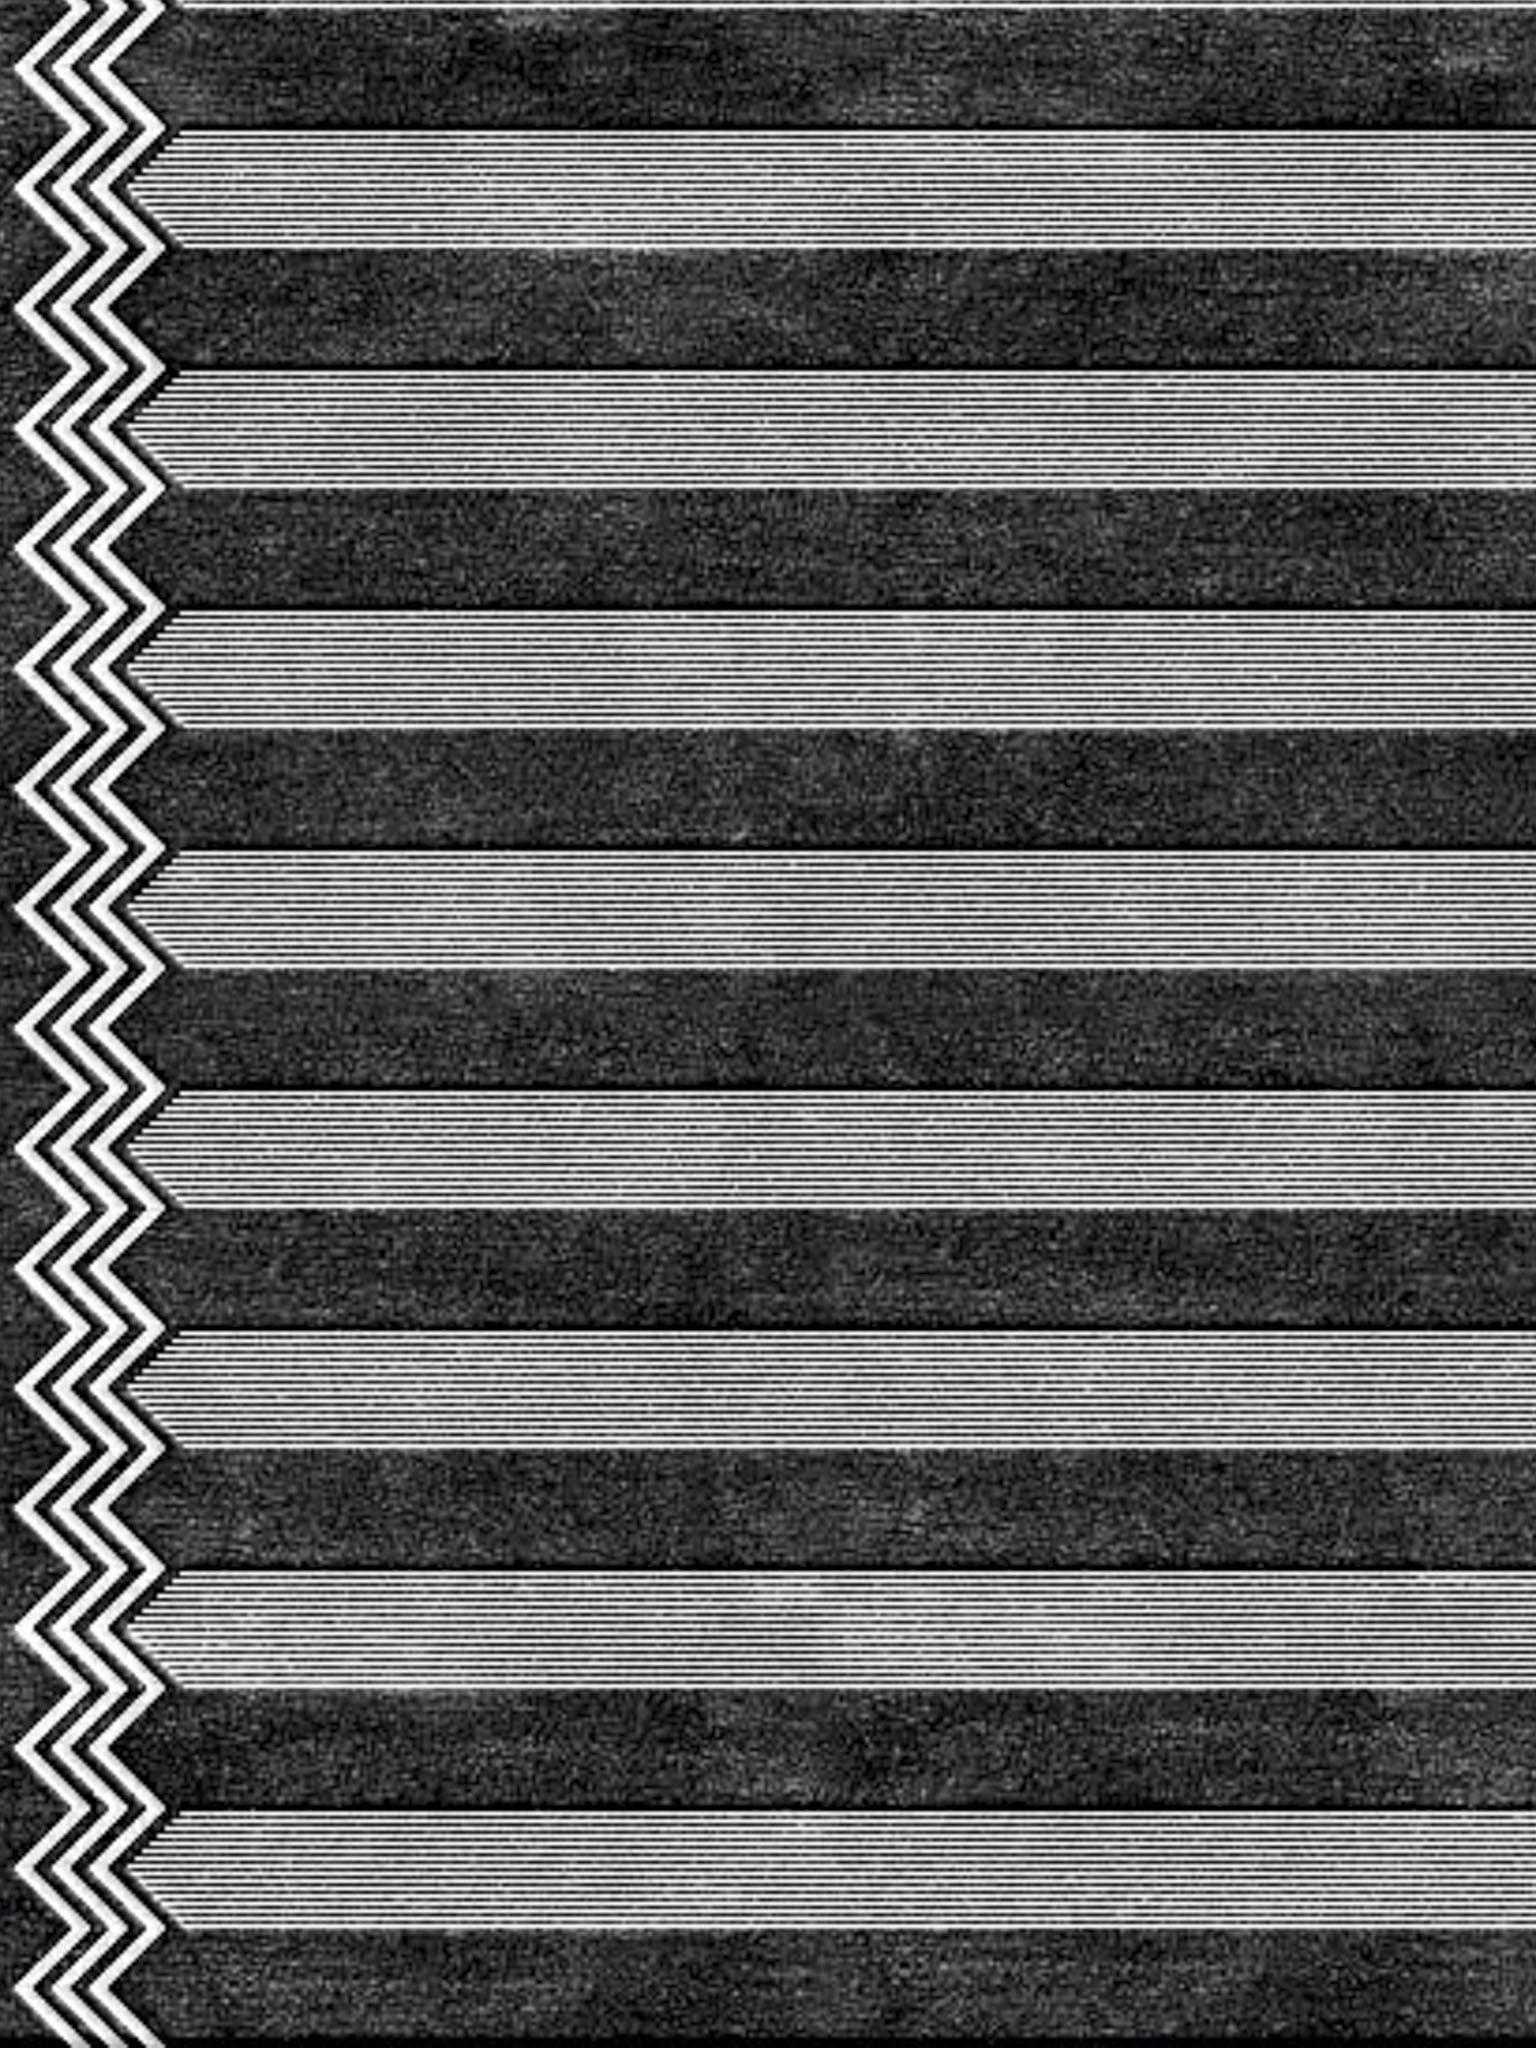 Woven Zig Zag Stripe VHH_PH482-0004